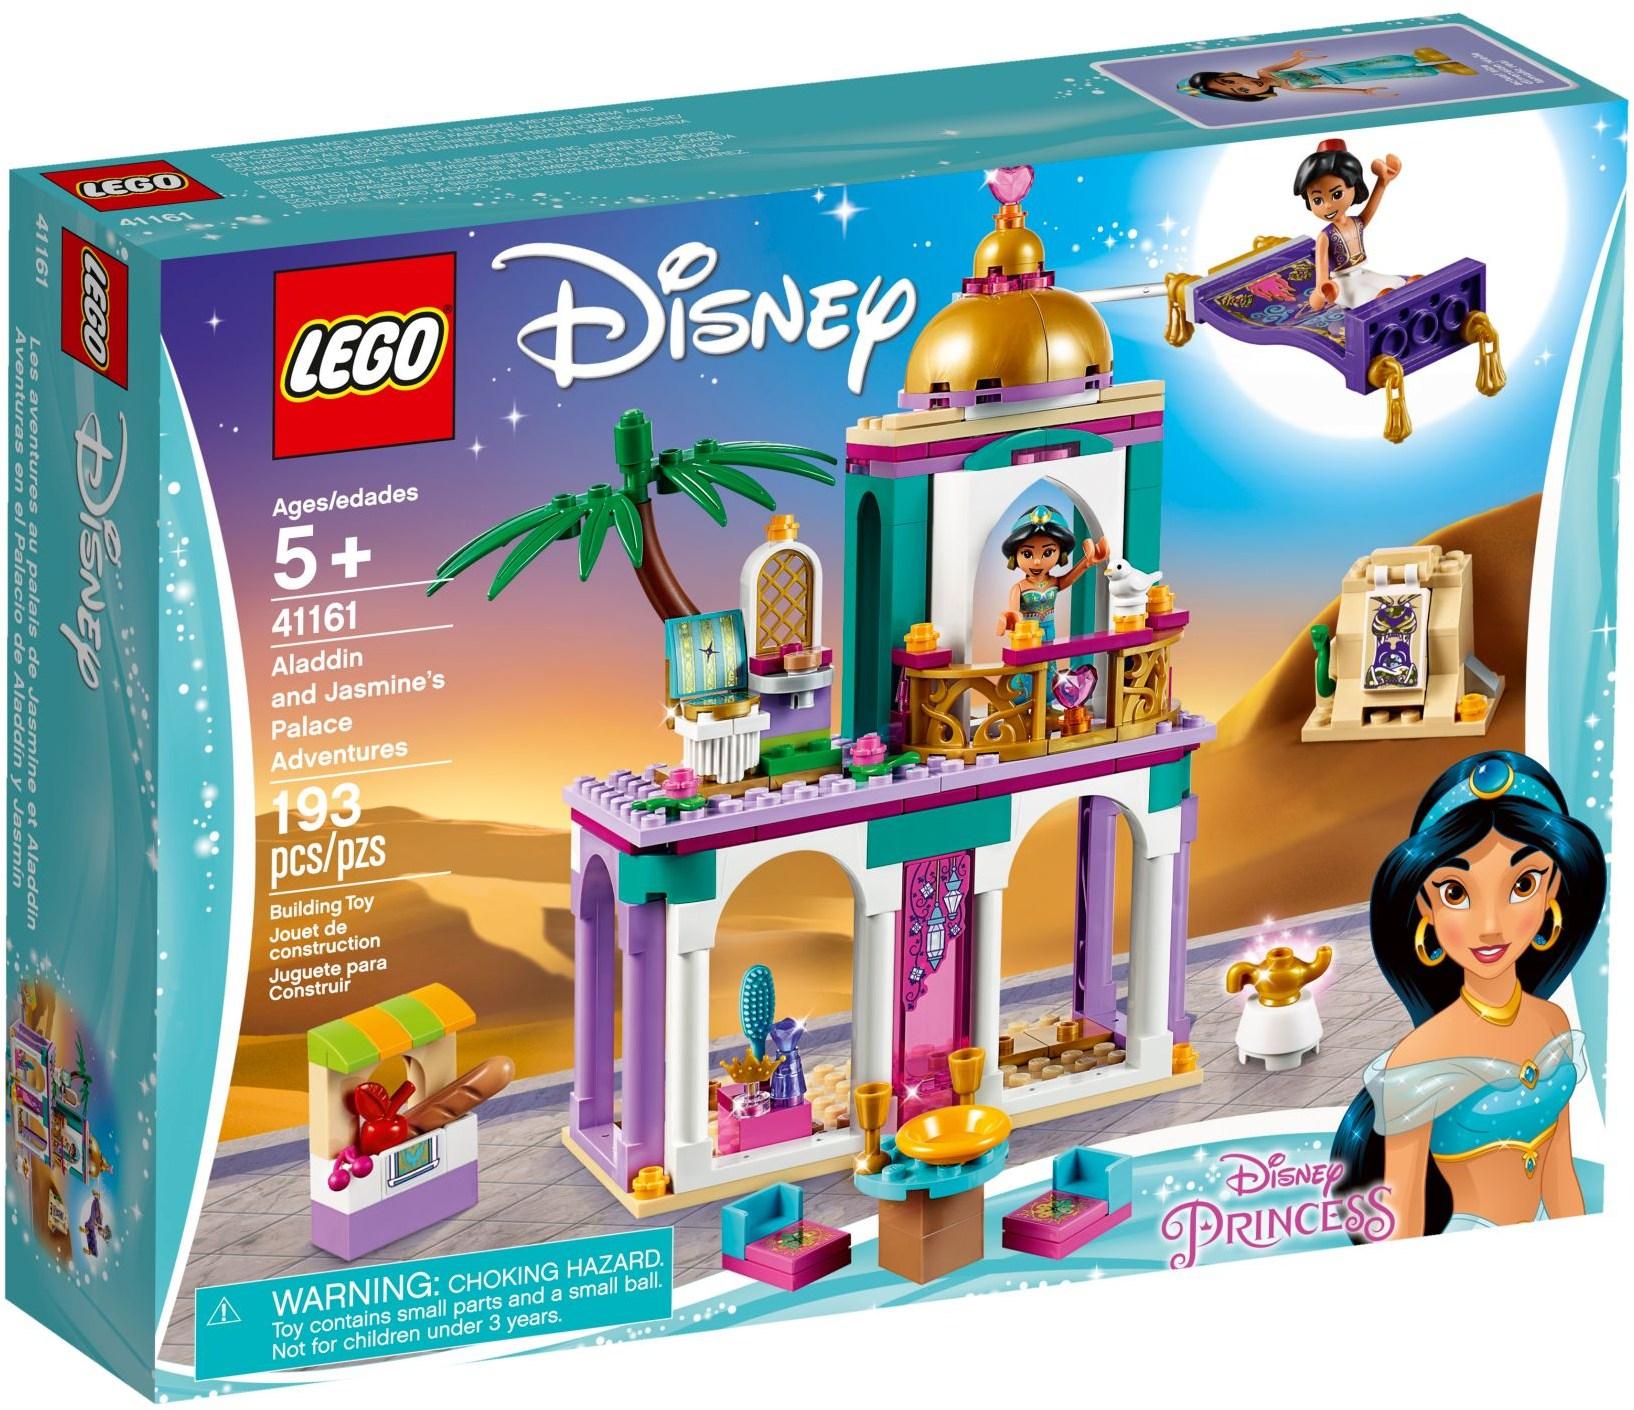 LEGO ALADDIN & JASMINES PALACE ADVENTURES - 41161